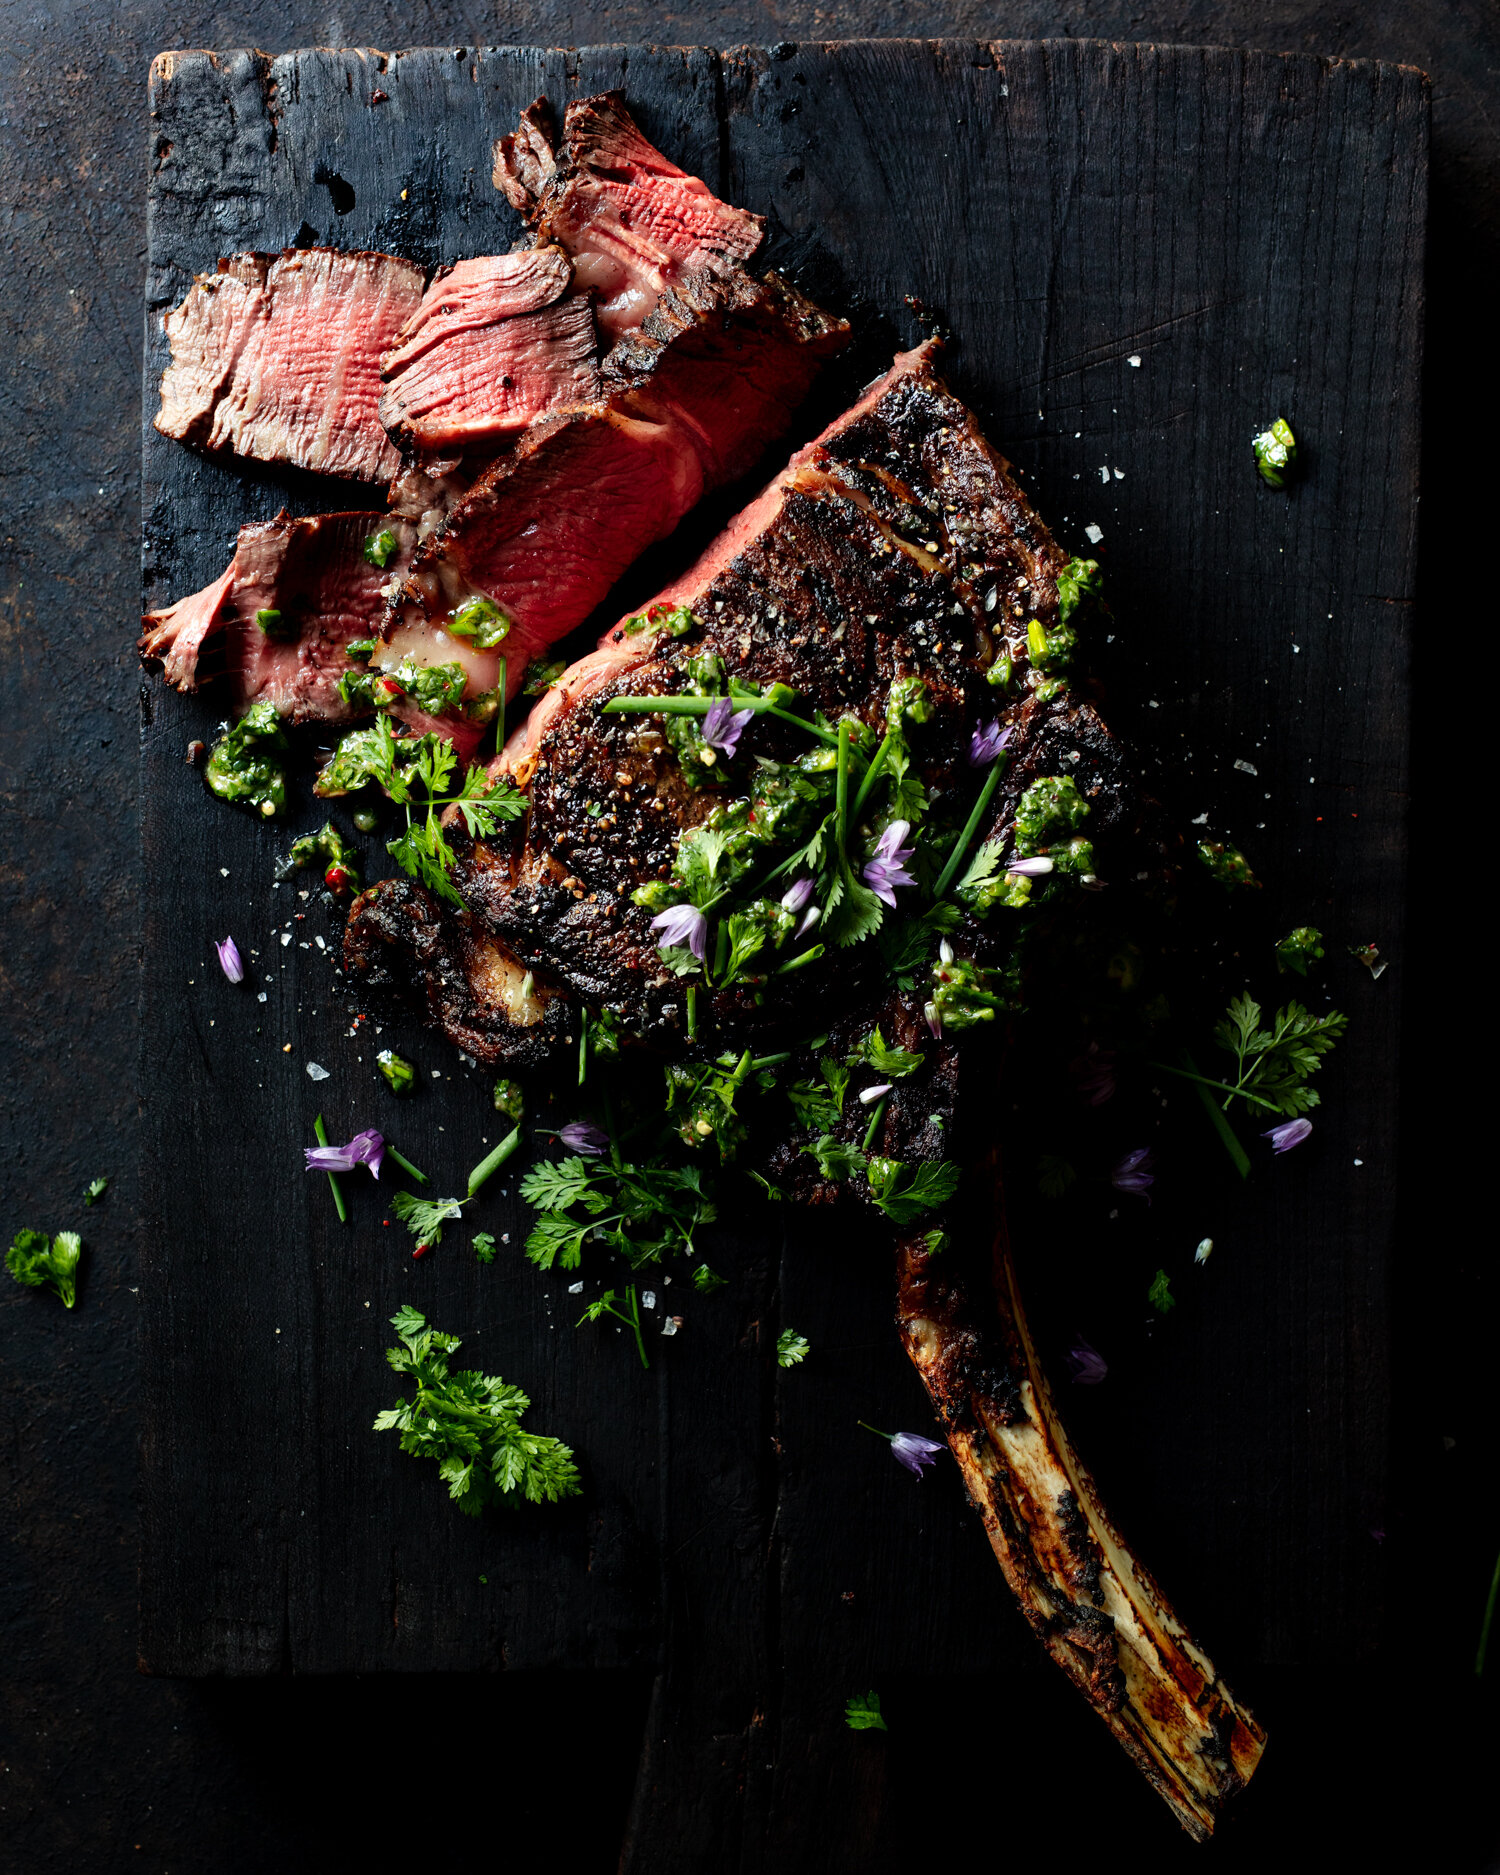 erin-scott_san-francisco-california-food-photographer-natural-light-editorial-grilled-steak-tomahawk-georgedolese_may2019-1854.jpg